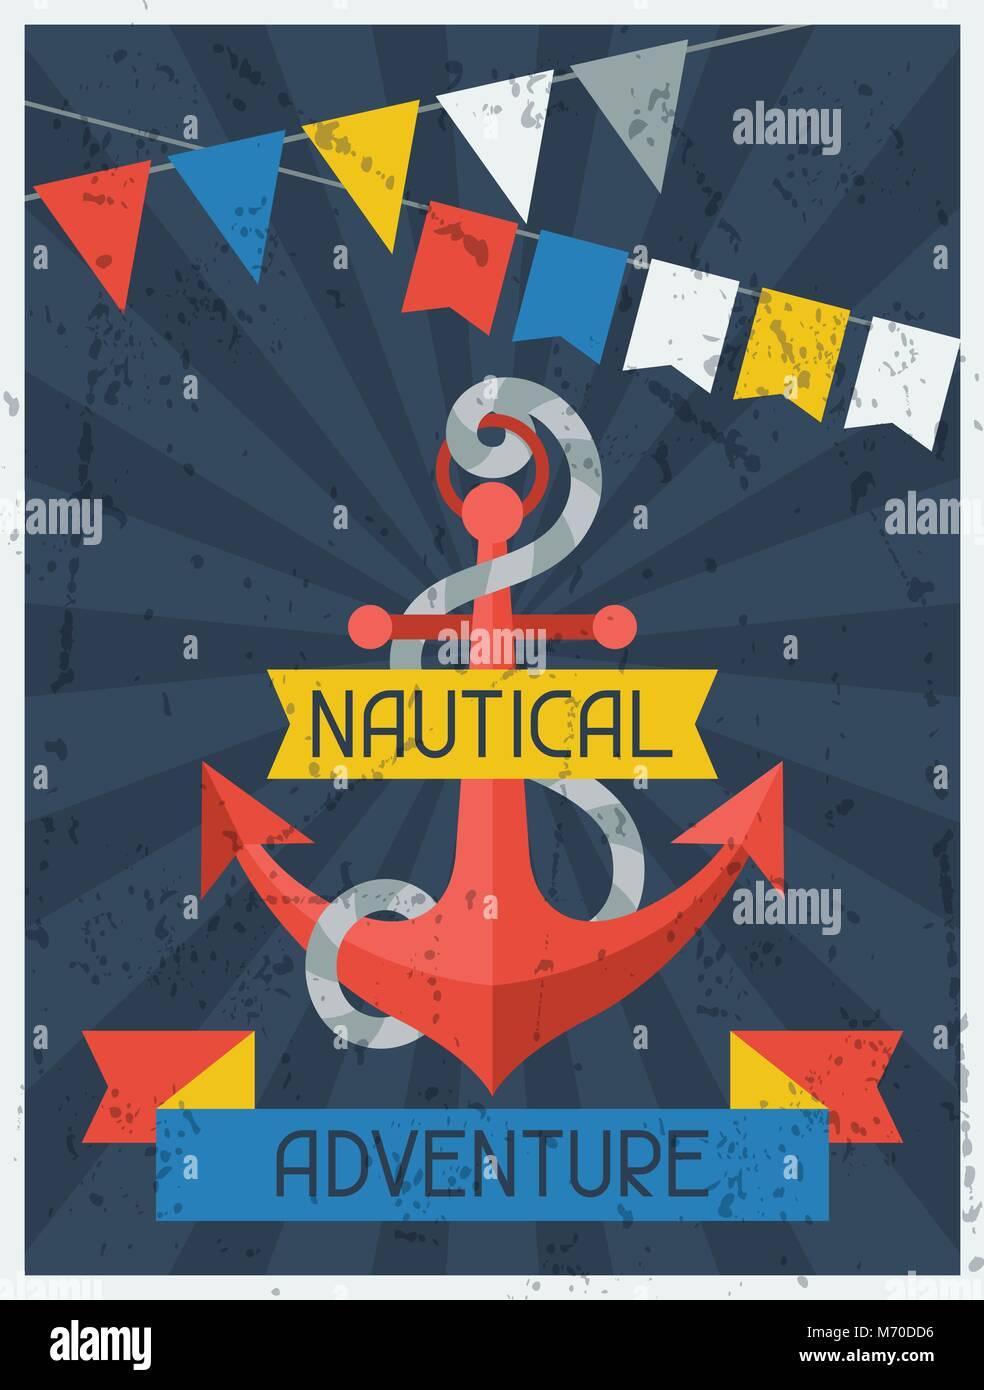 Nautical Adventure. Retro poster in flat design style - Stock Vector